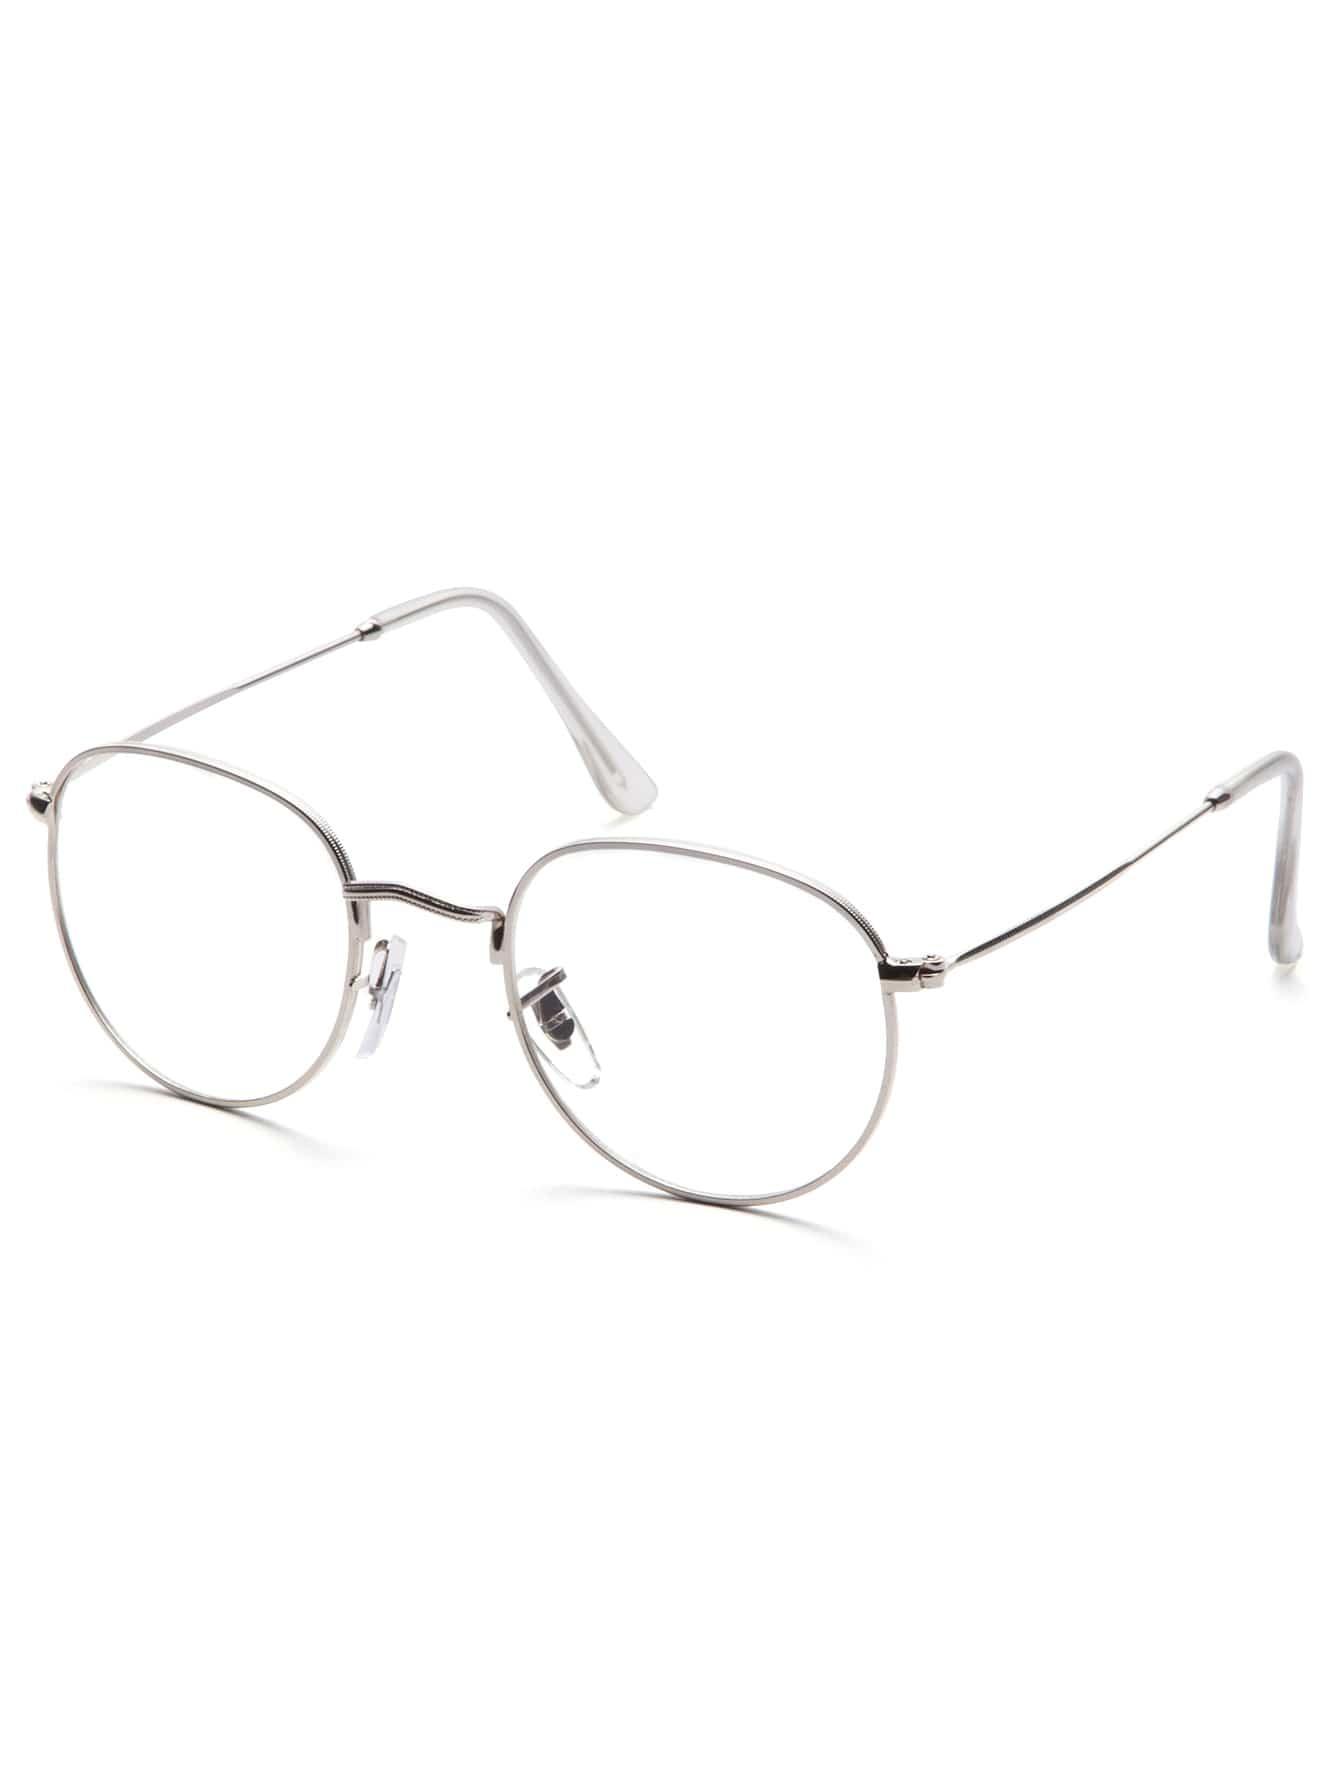 Silver Frame Clear Lens Glasses